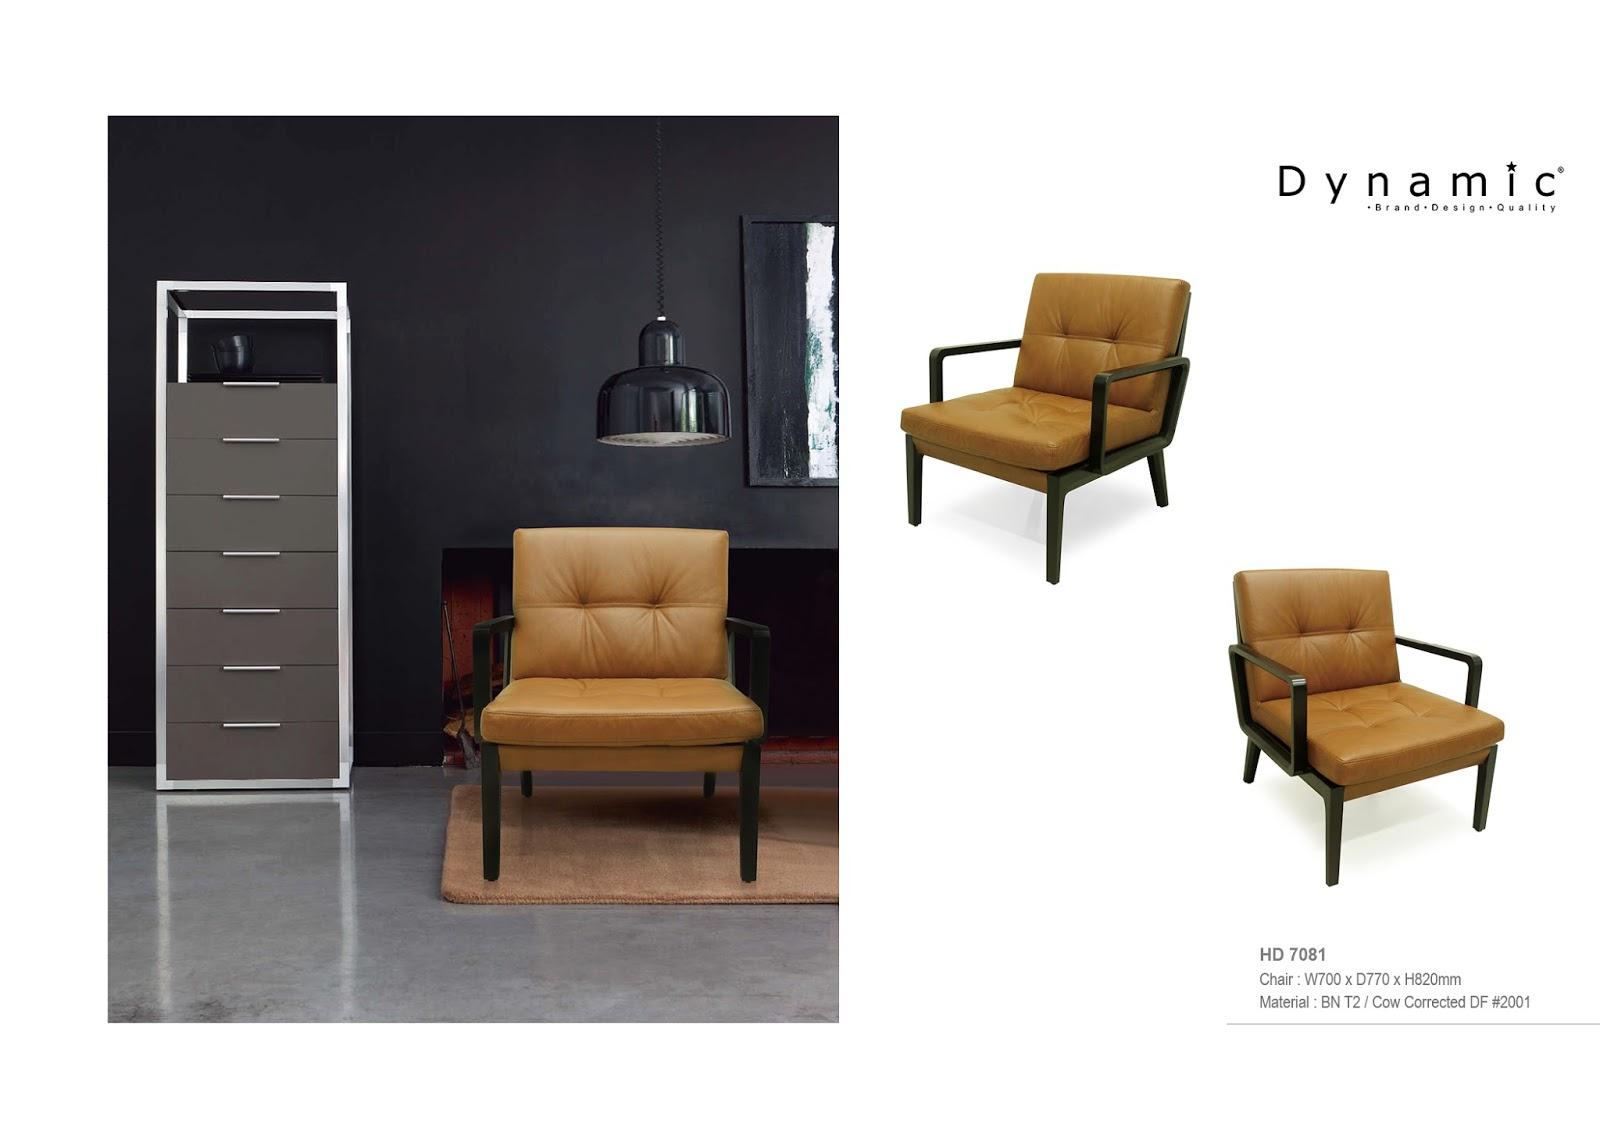 wood furniture pics. DYNAMIC FURNITURE CHAIR MODEL AND DESIGN Wood Furniture Pics O